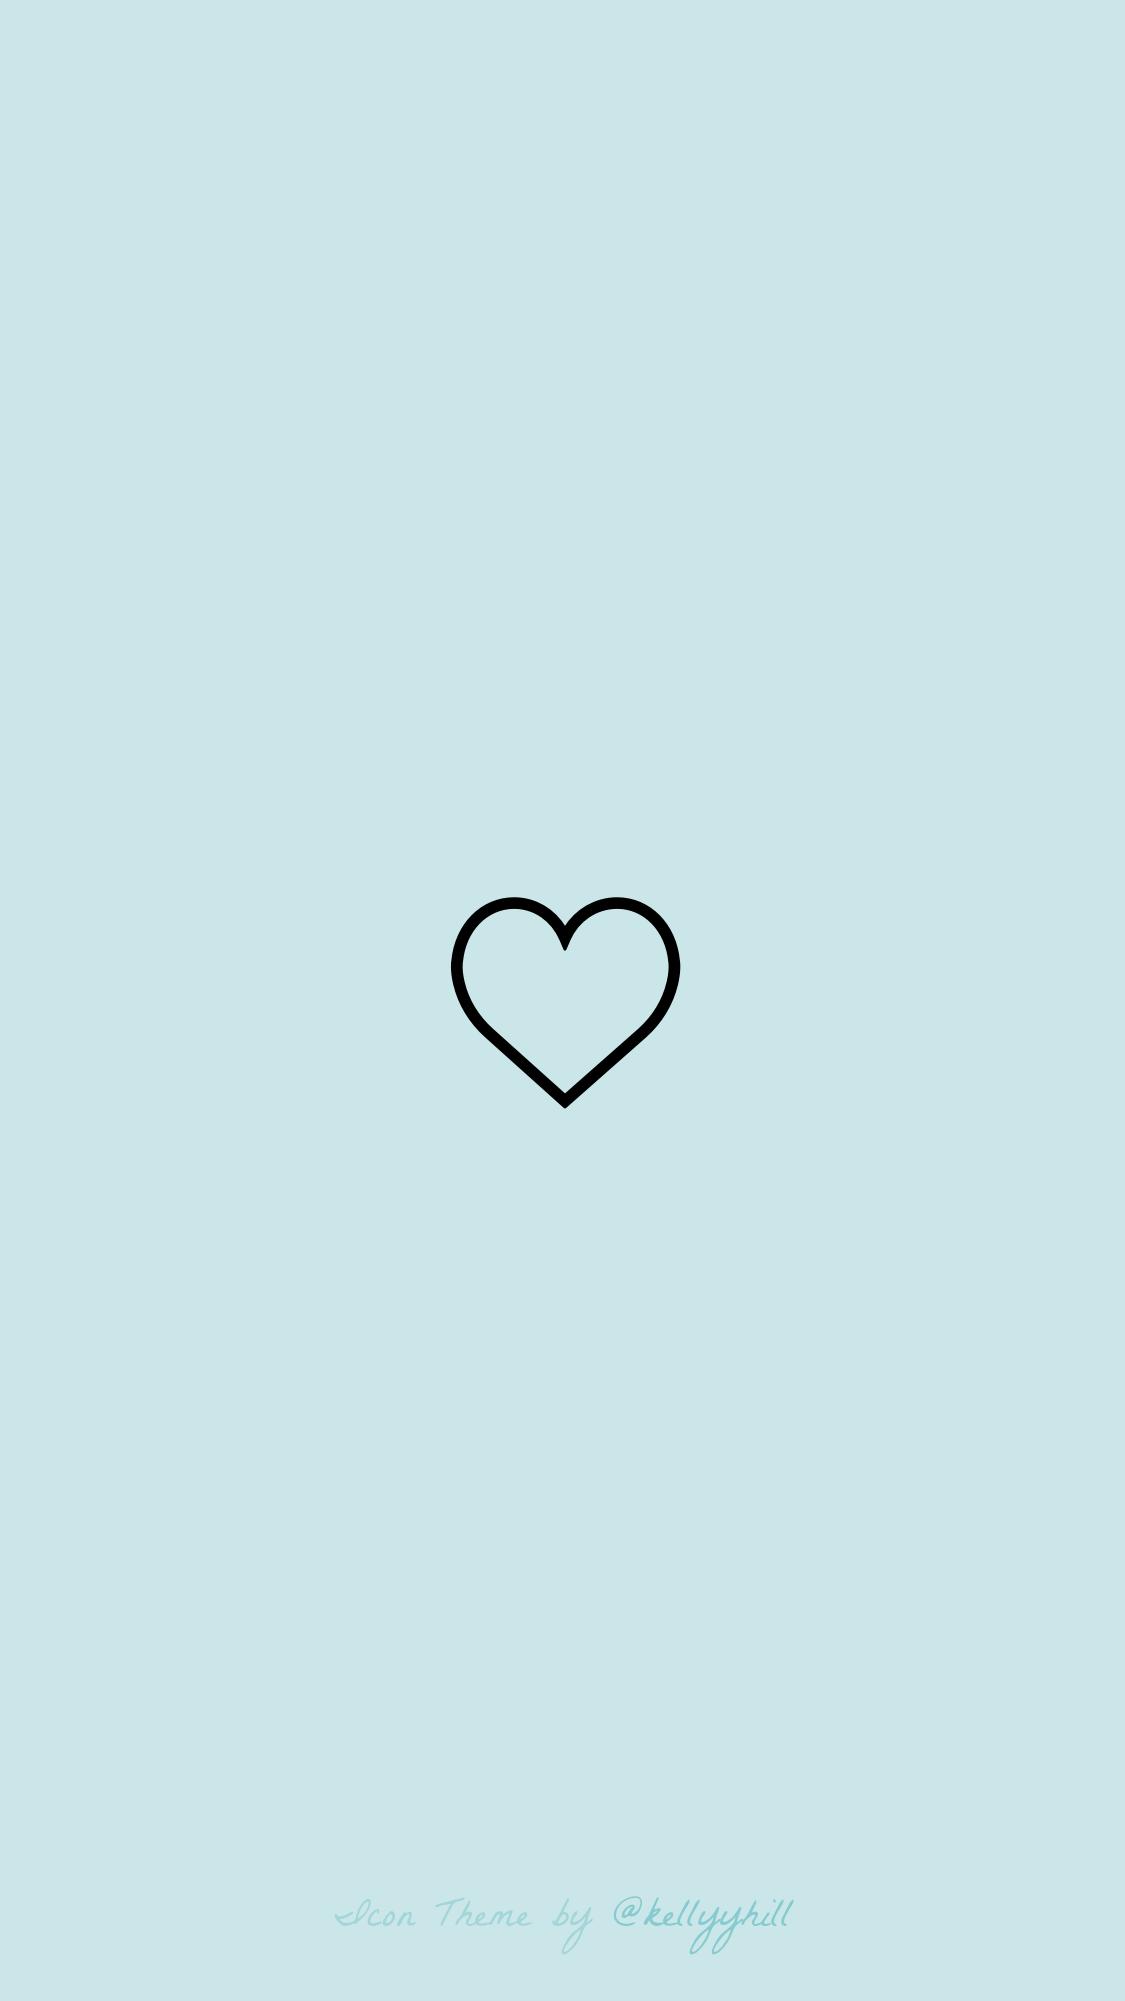 Kelly Hill - Free Instagram Highlights Template - Wanderlust Blue 02